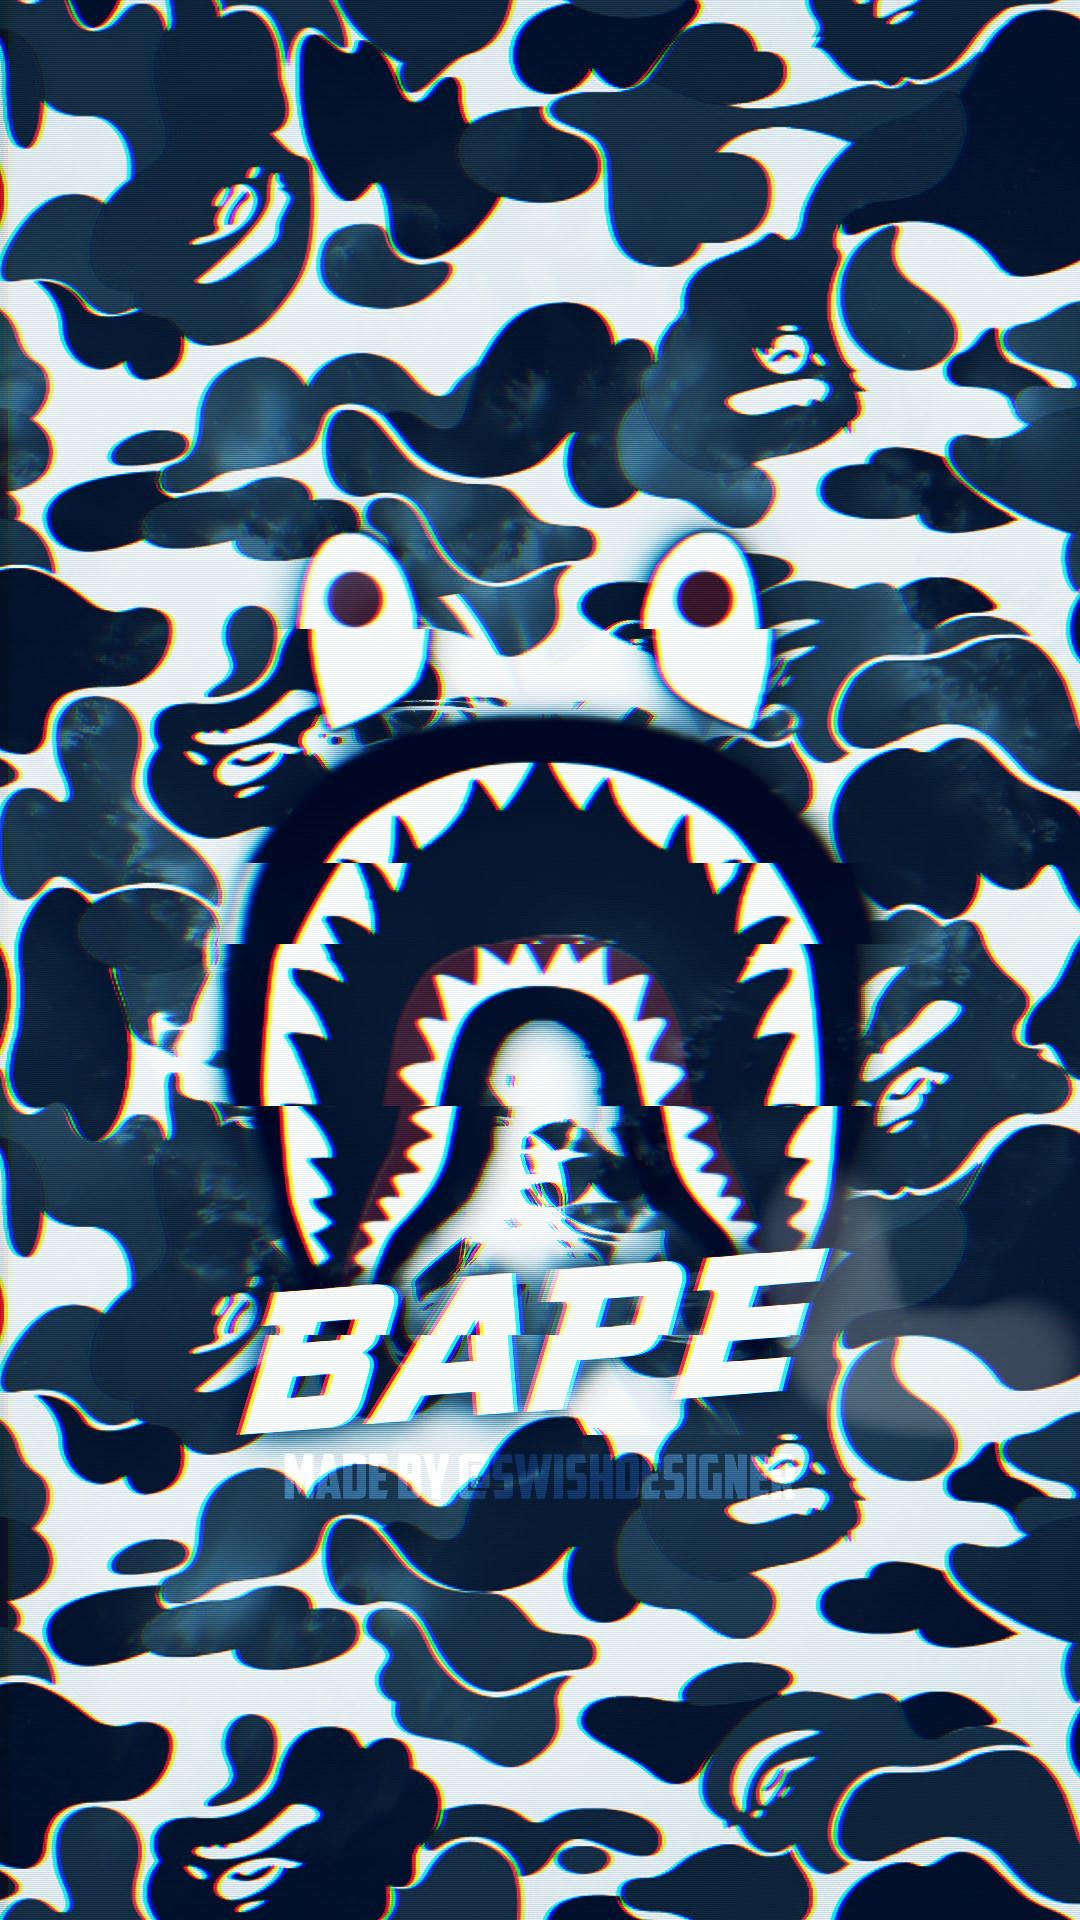 Bape Shark Wallpapers Wallpaper Cave